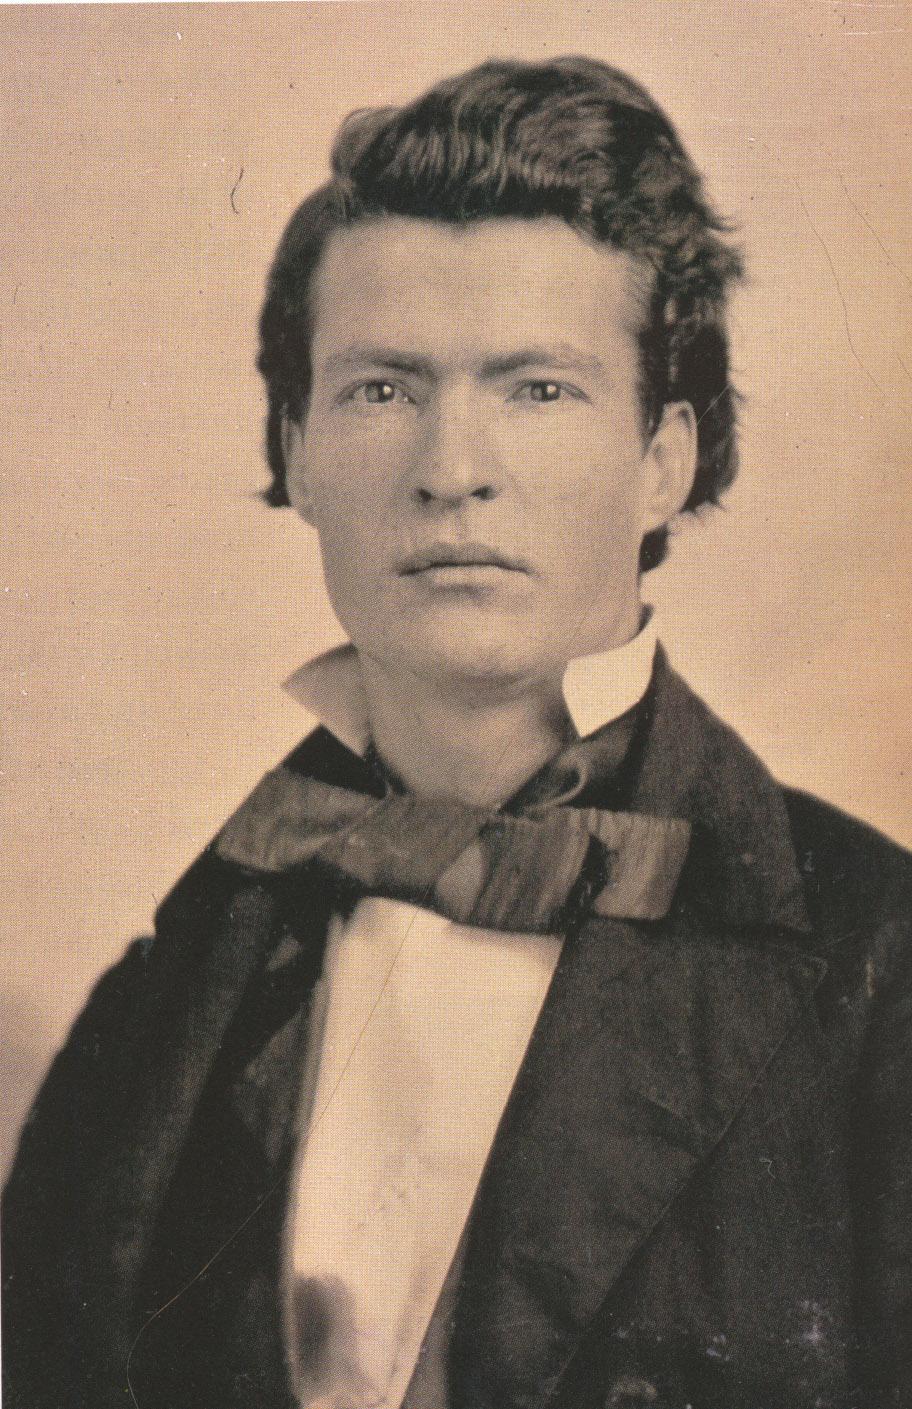 Samuel Clemens, en torno a 1851-1852